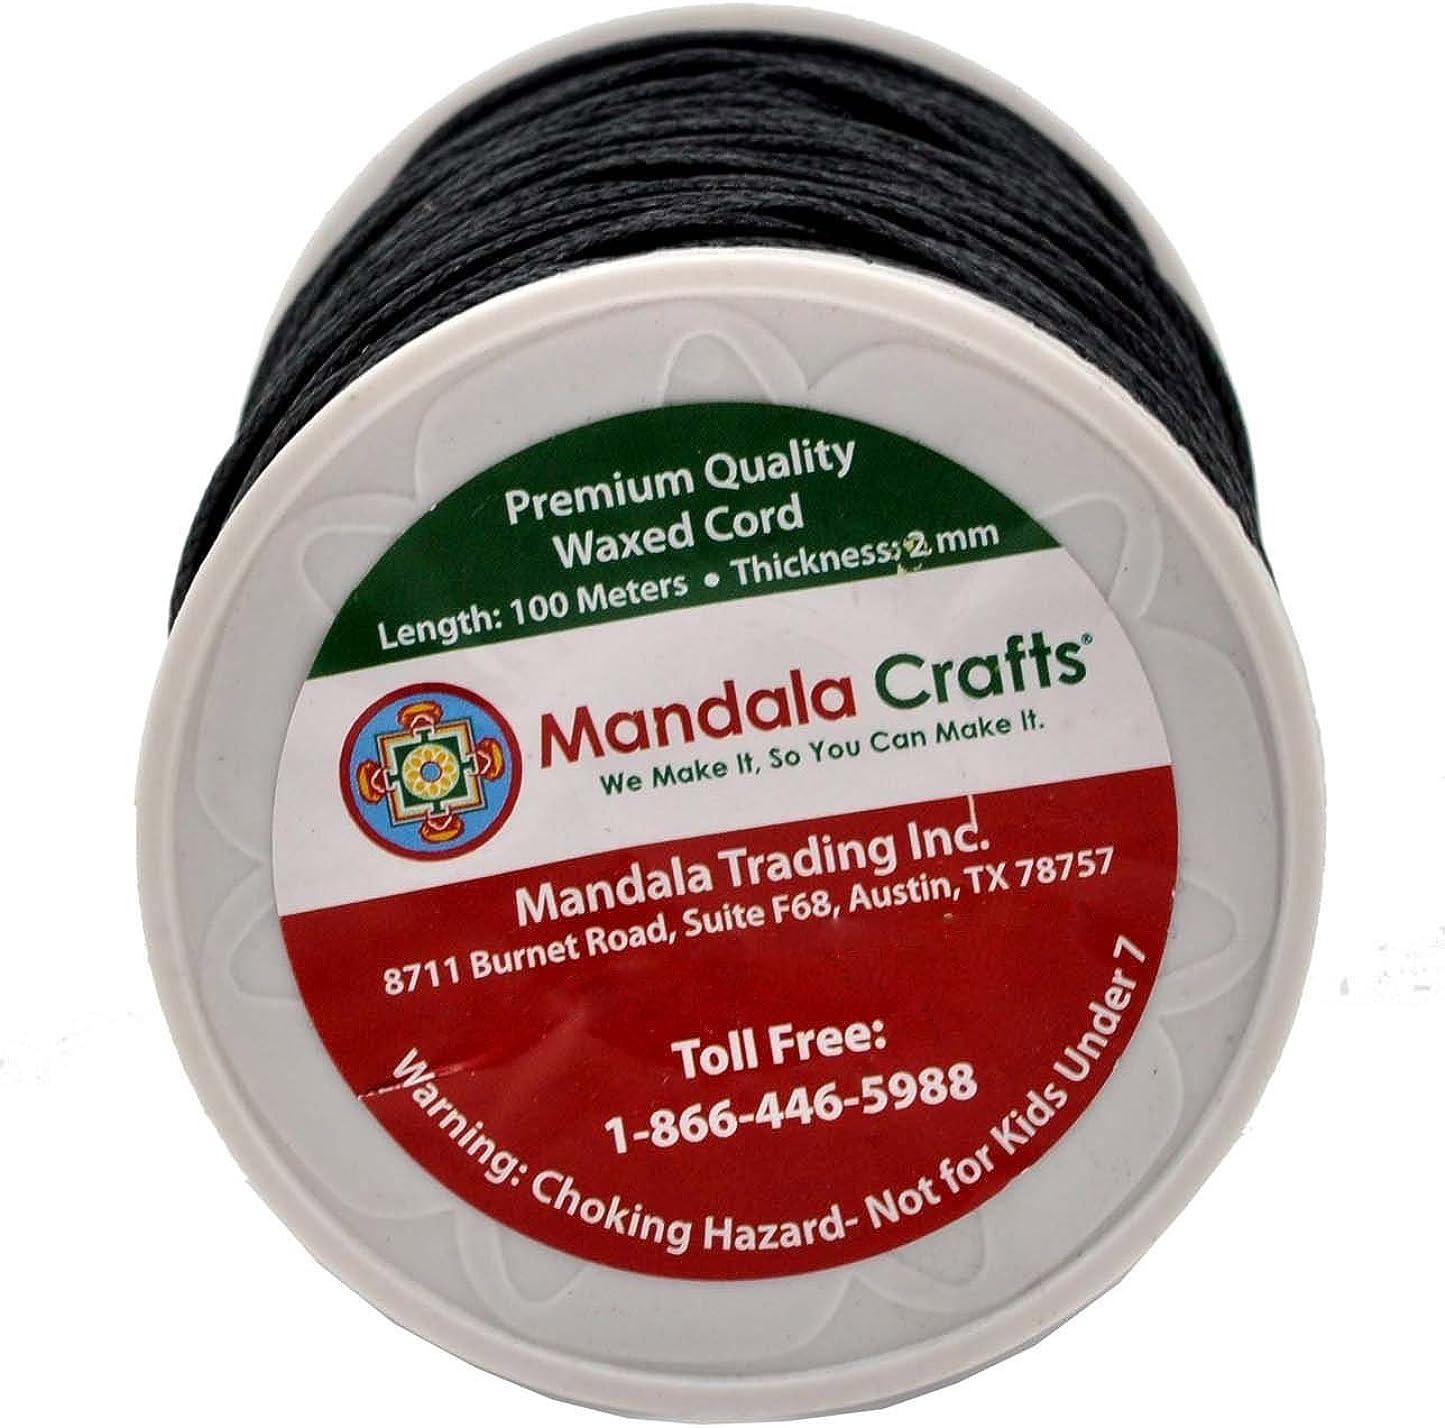 Mandala Crafts 2mm 109 Yards Jewelry Making Beading Crafting Macram/é Waxed Cotton Cord Rope